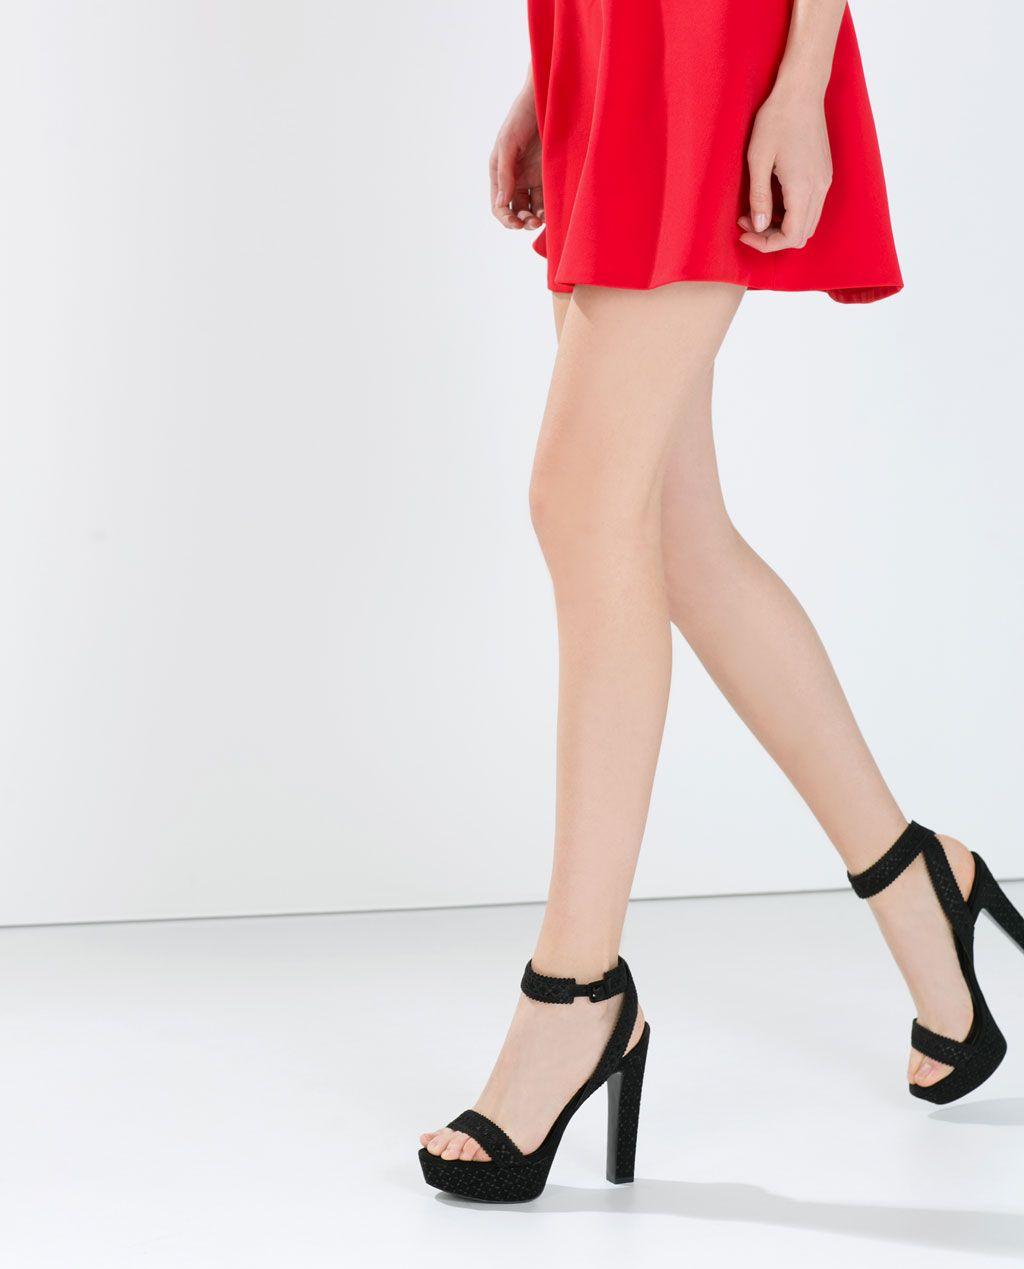 cb0b5c8daba PLATFORM HEEL SANDAL-Sandals-Shoes-WOMAN